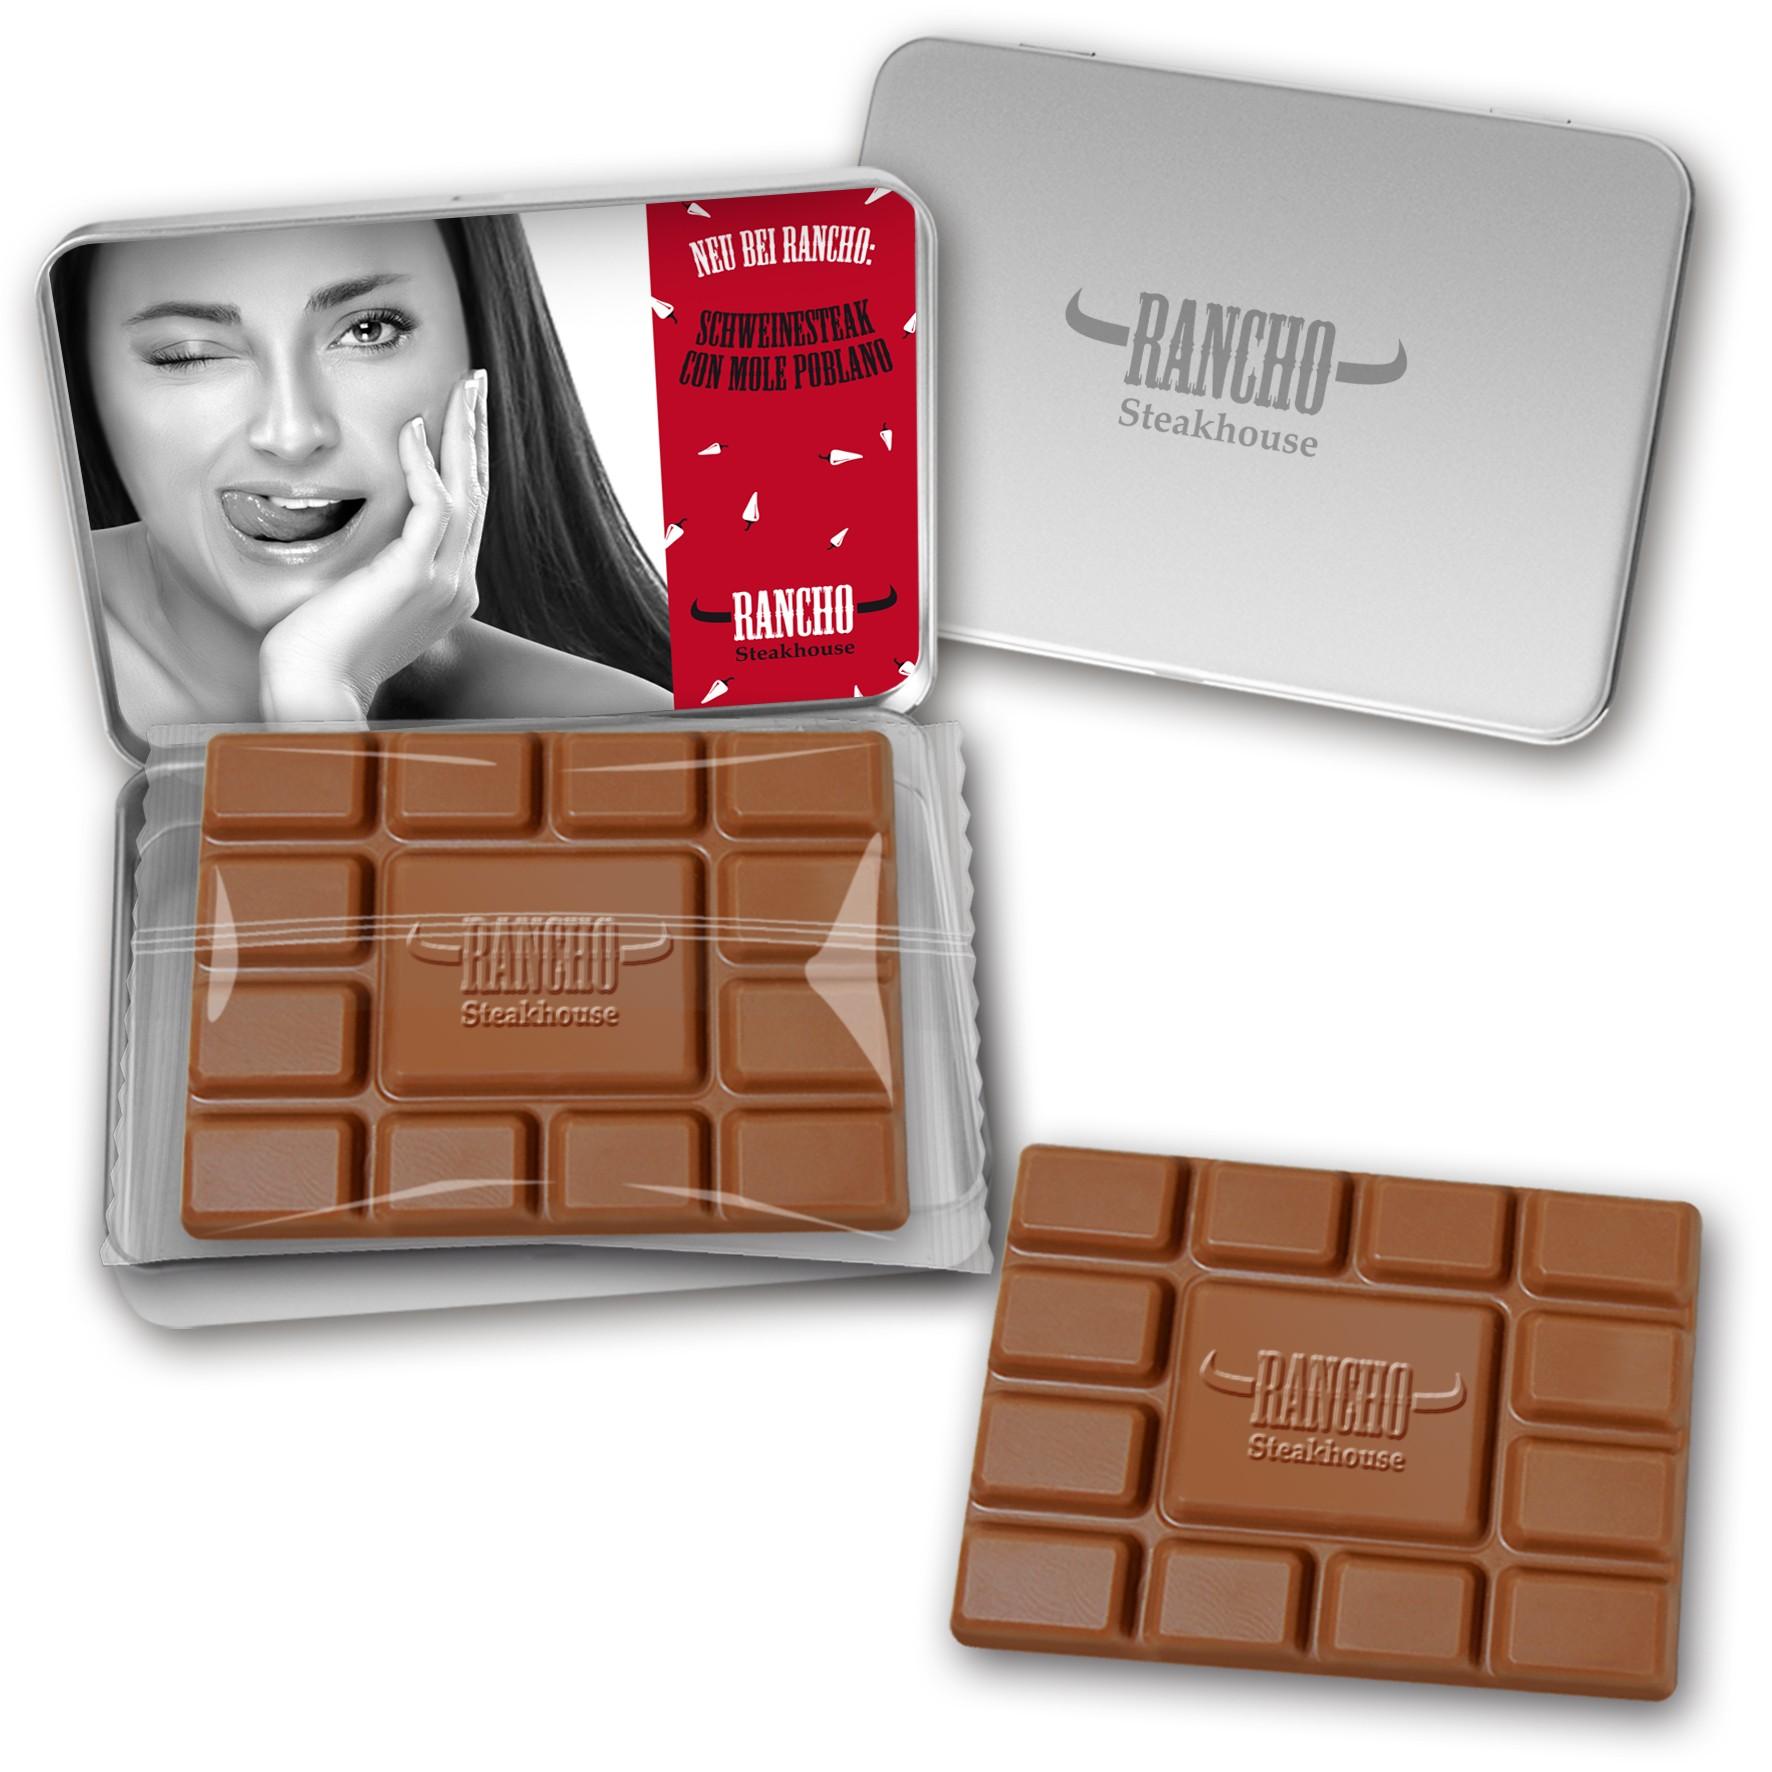 Schokoladentafel mit Prägung